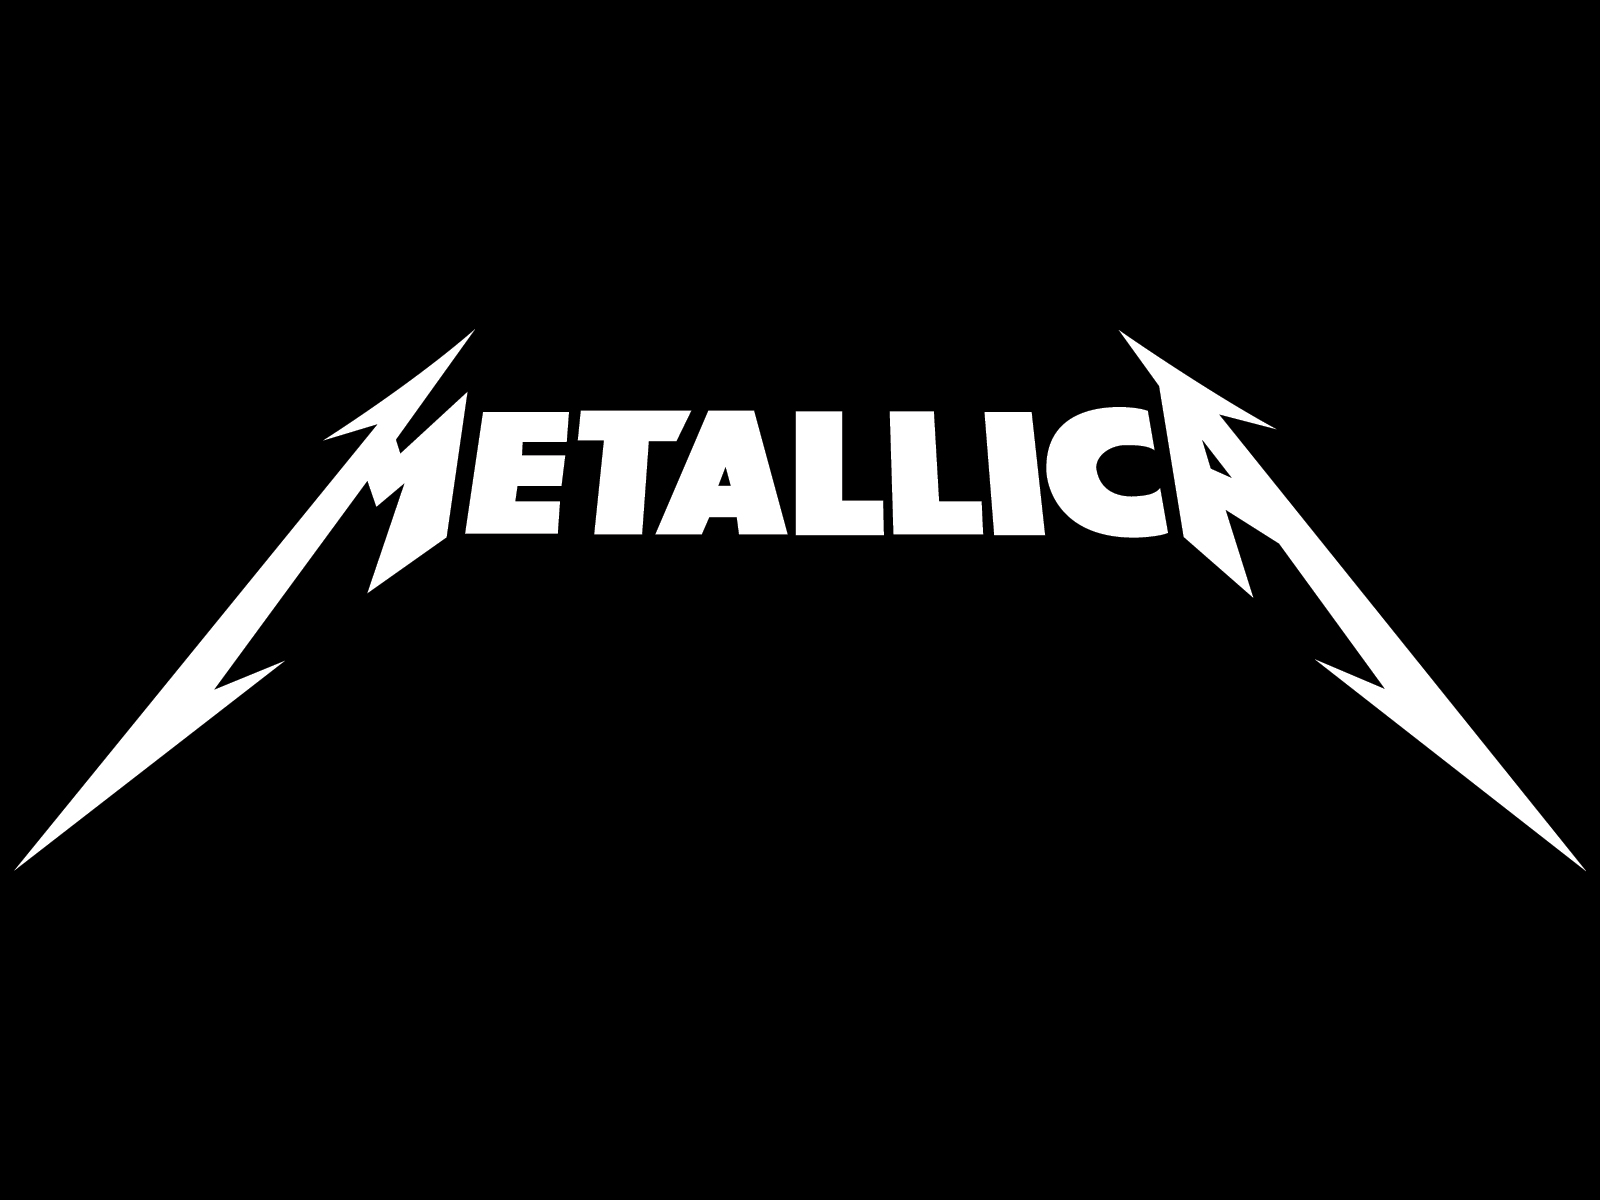 Metallica Logo images 1600x1200